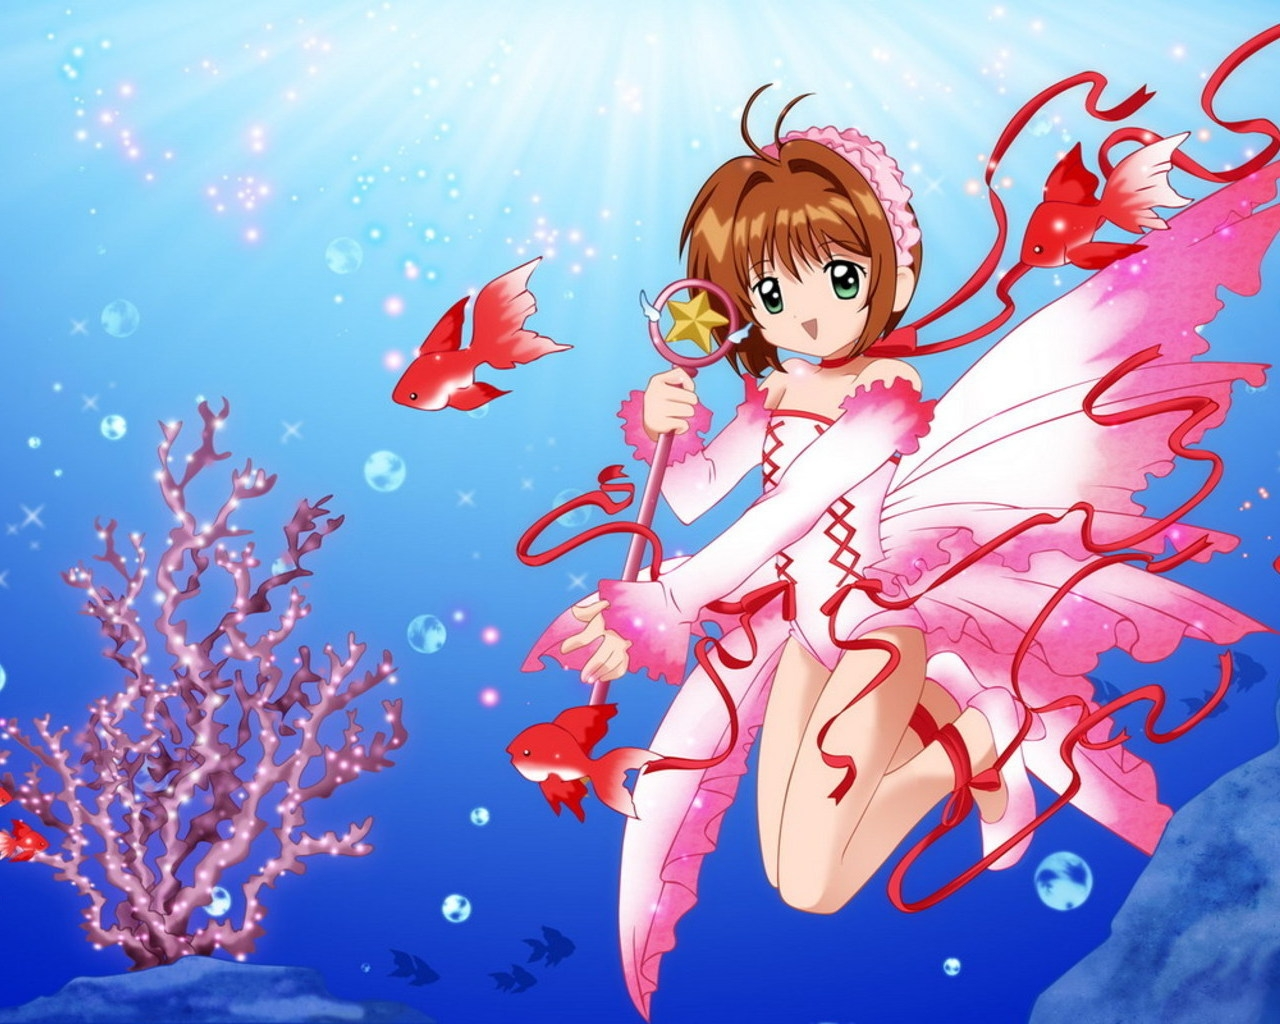 Sakura Anime